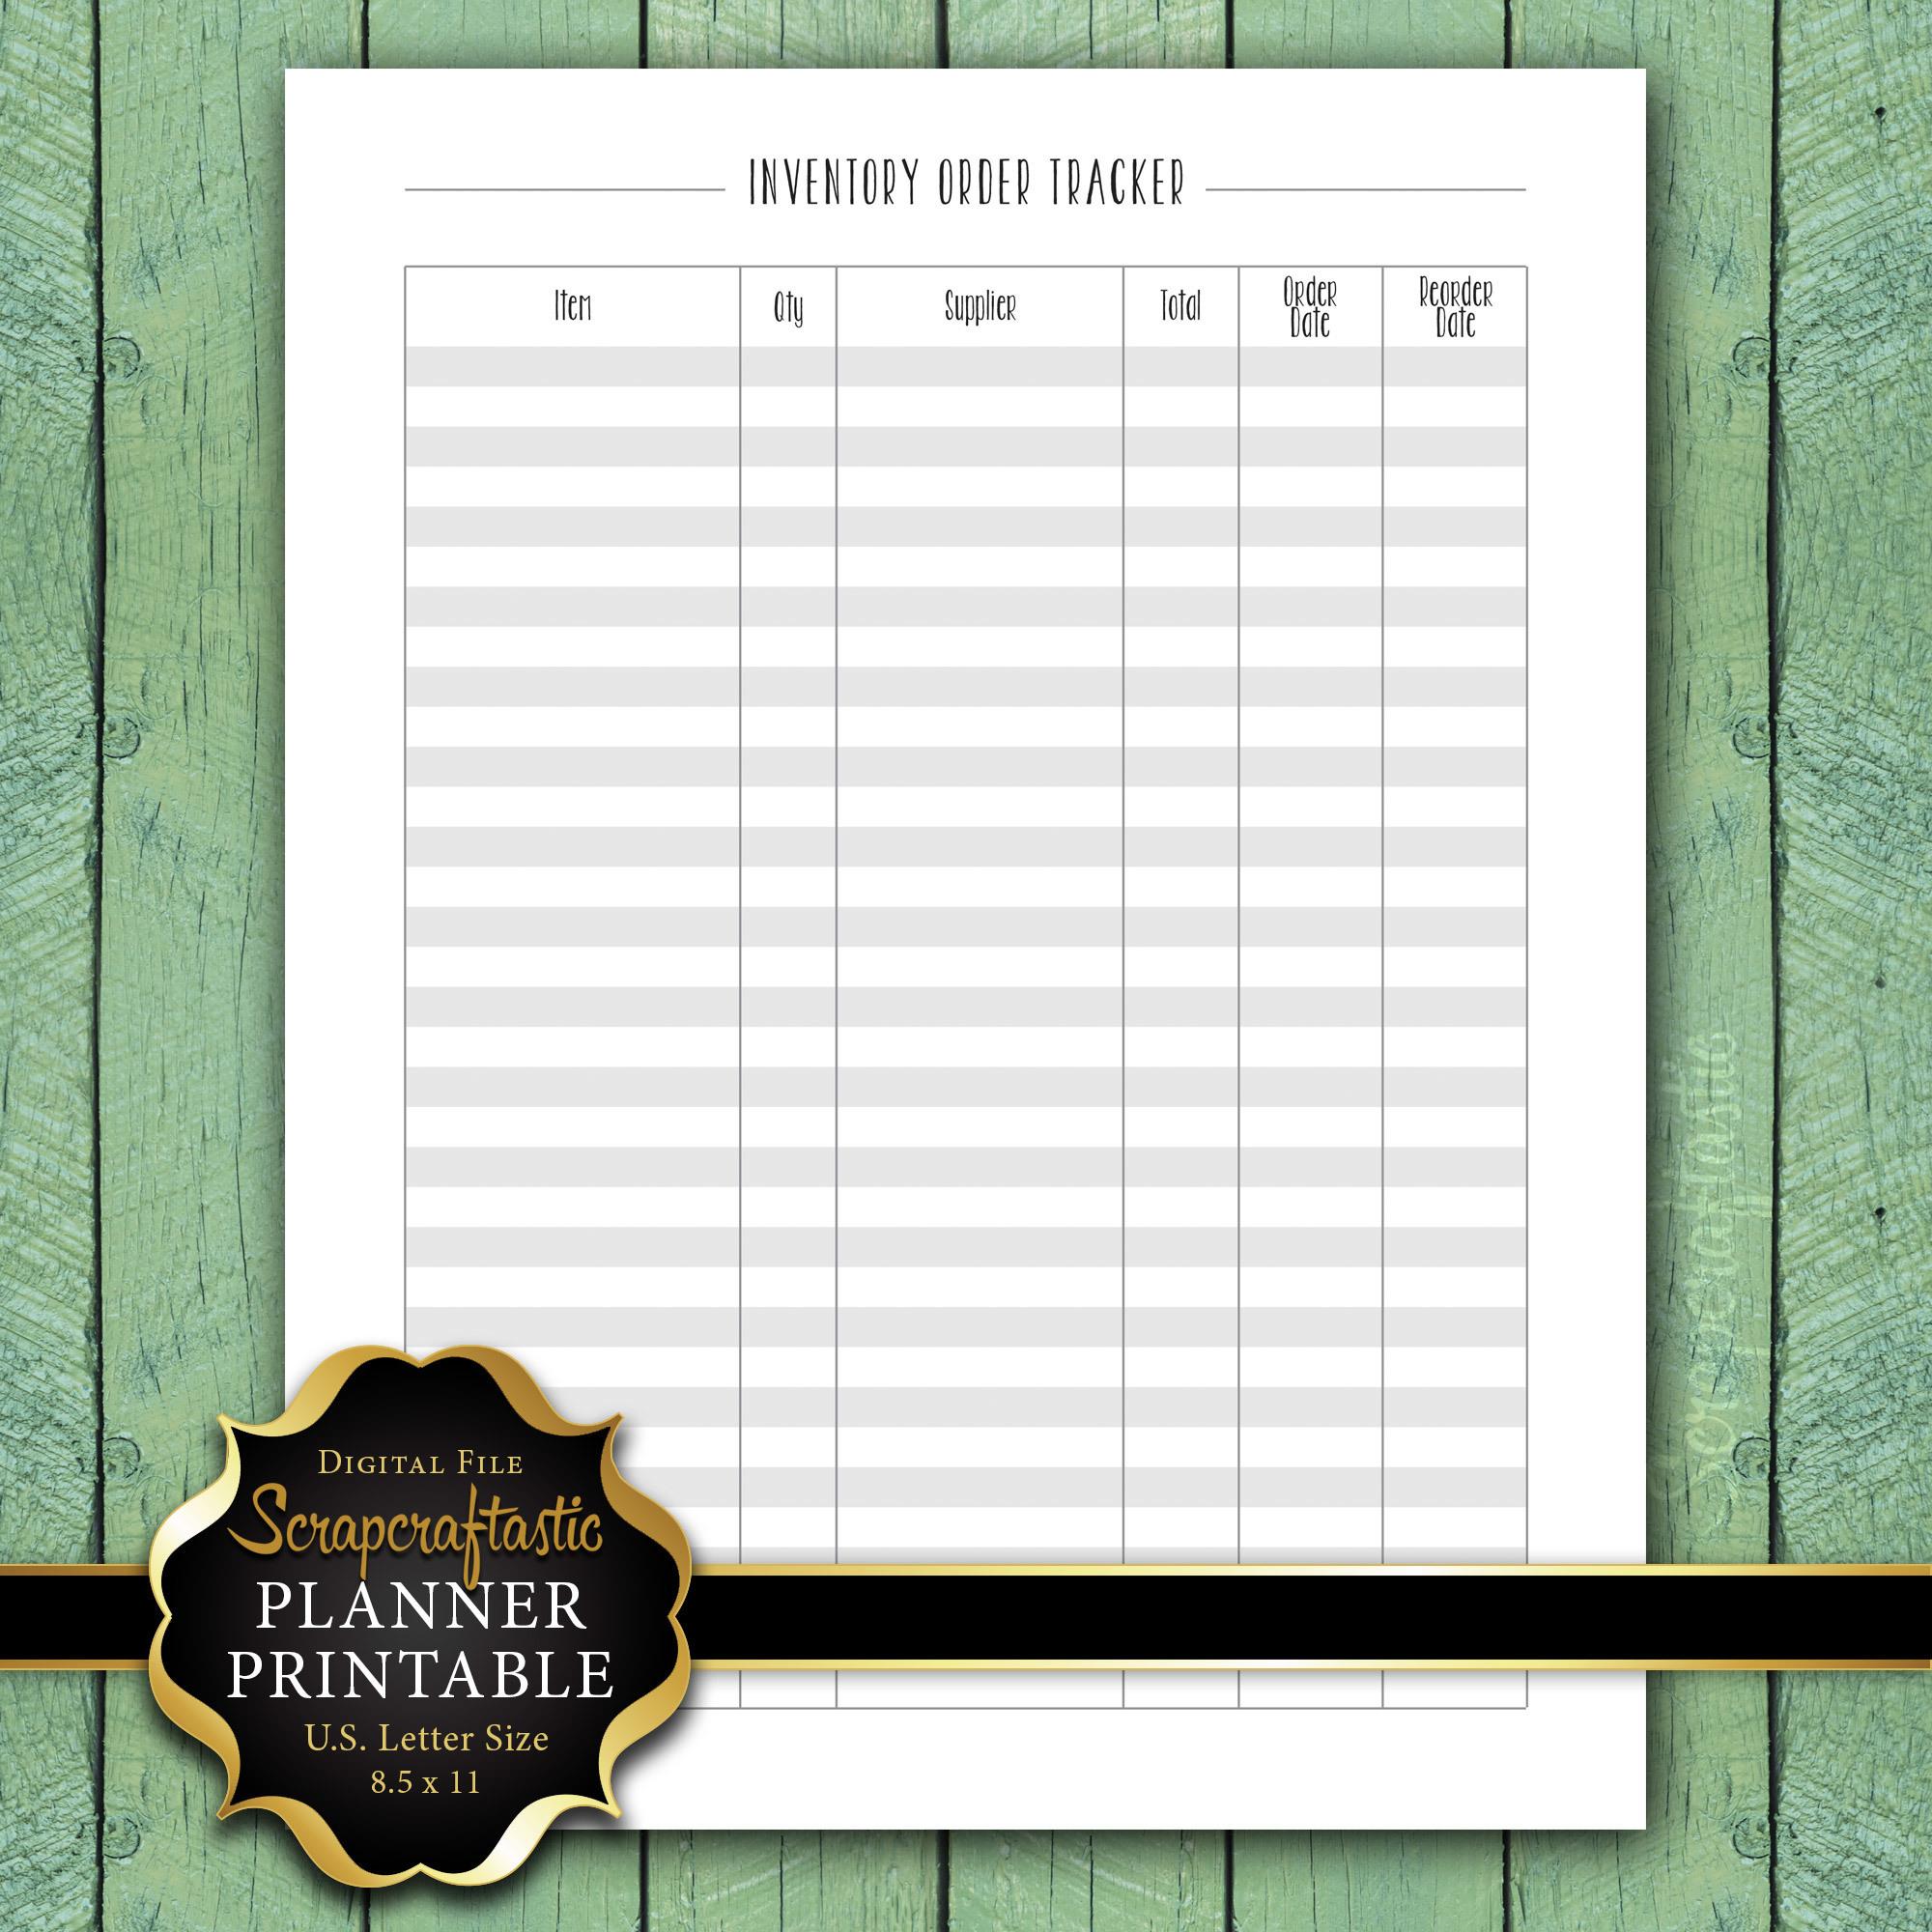 Inventory Order Tracker Letter Size Planner Printable dbr_ltr_inventoryordertracker